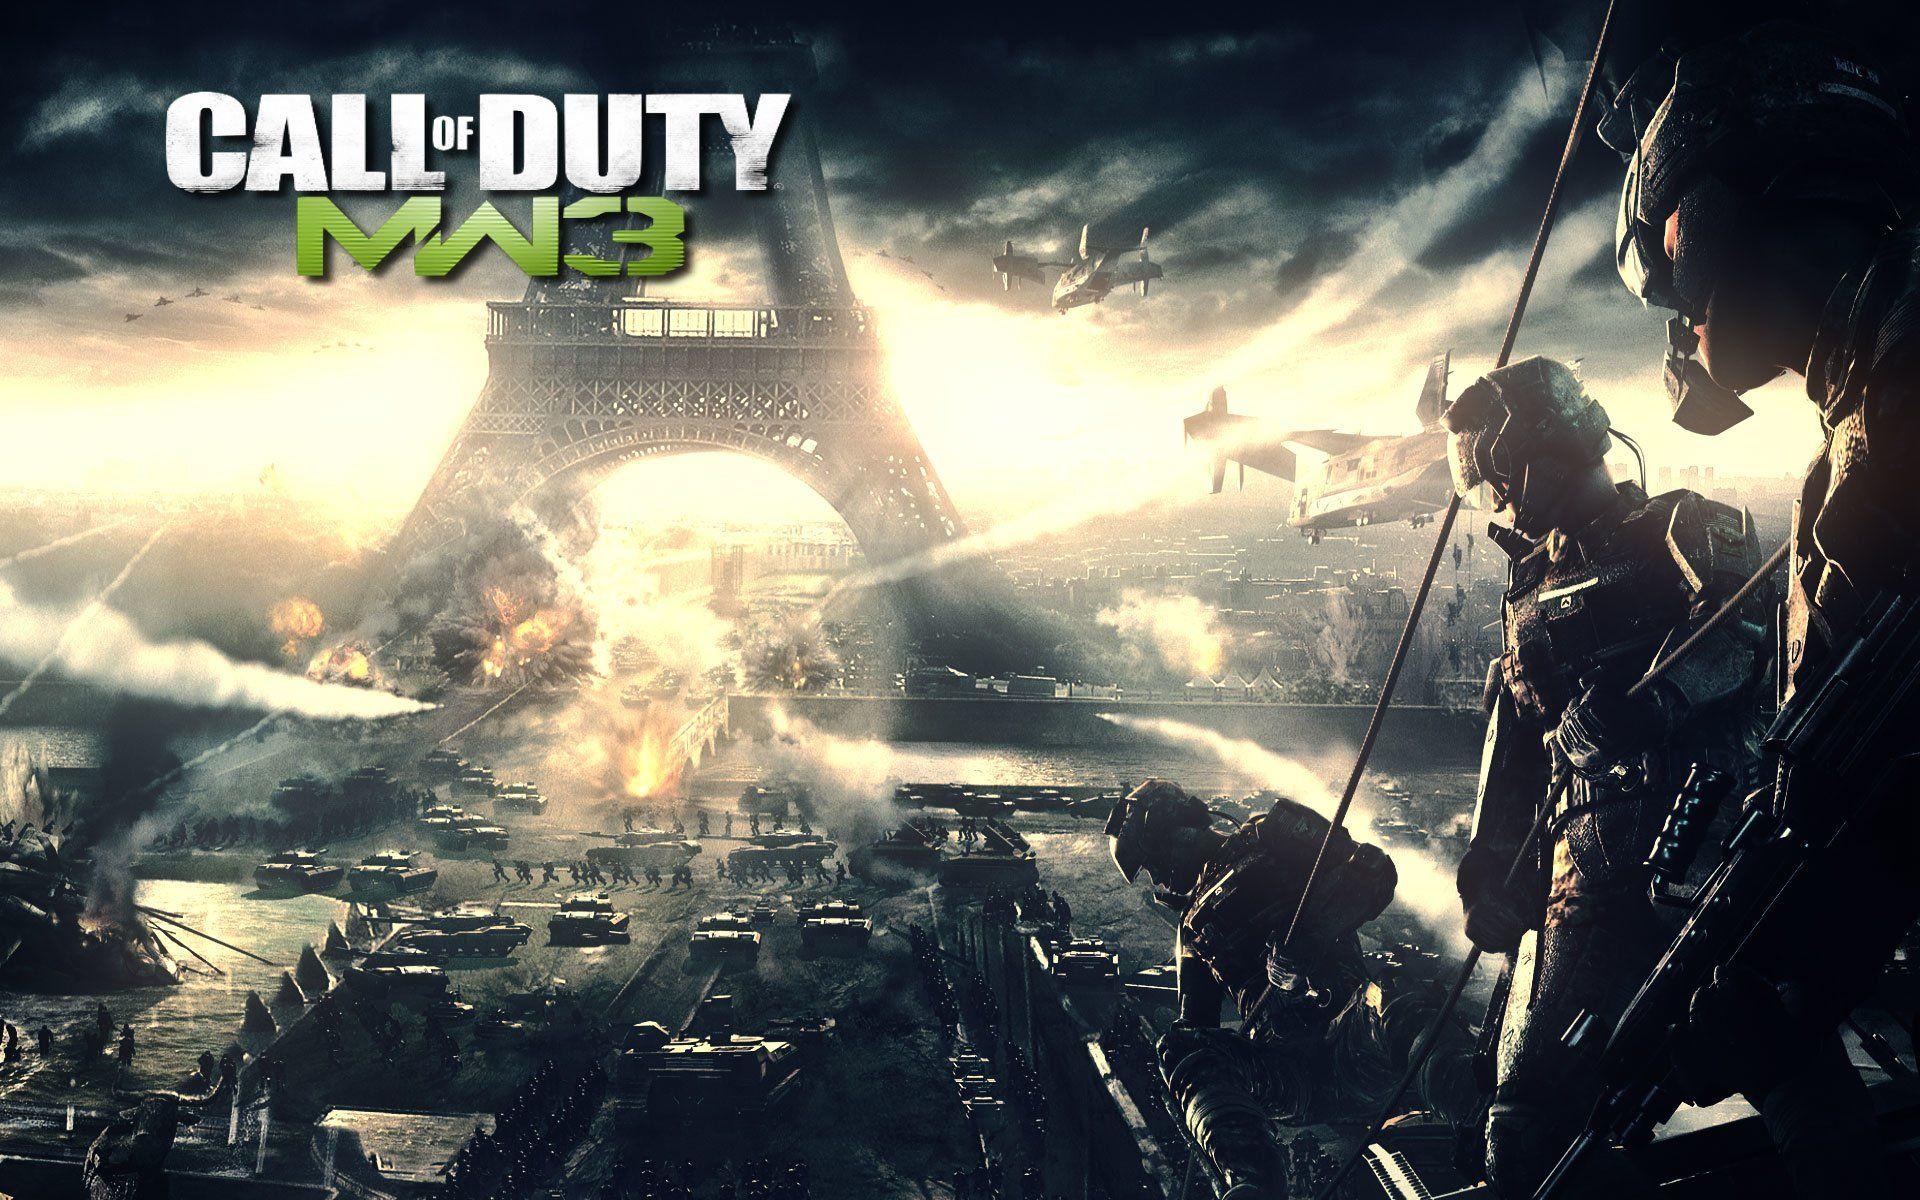 23 Call Of Duty Modern Warfare 3 HD Wallpapers